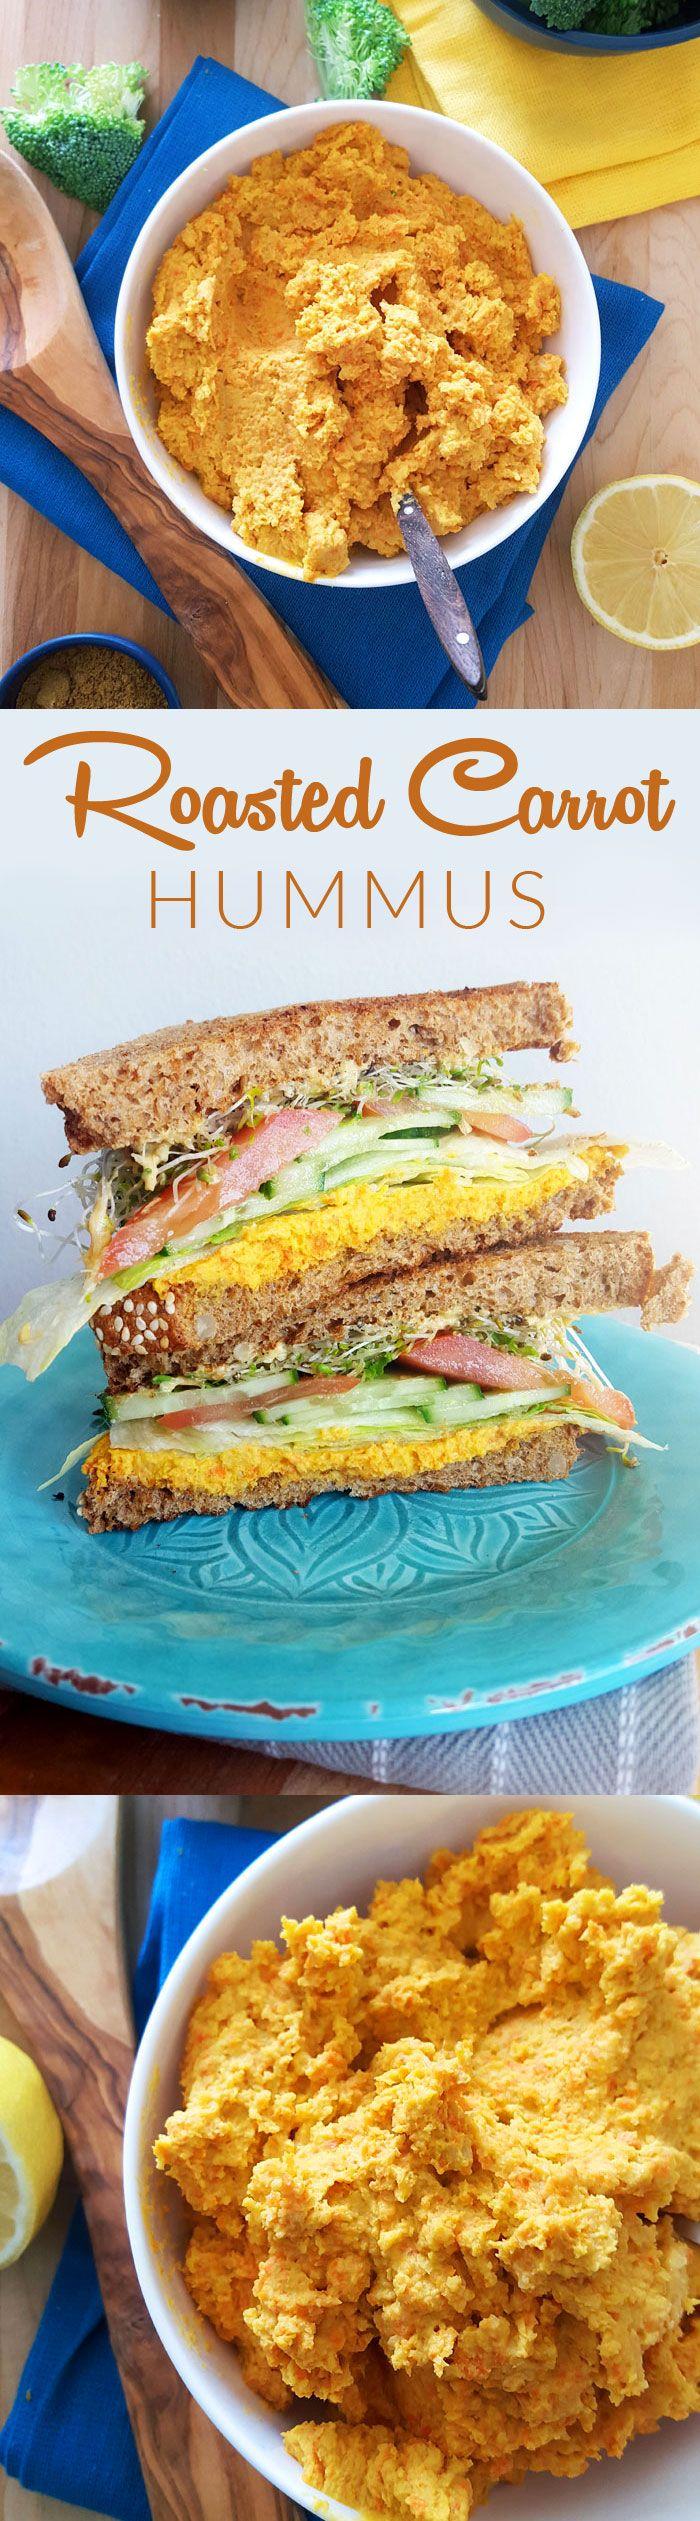 Healthy Roasted Carrot Hummus - Try it in a sky-high veggie-packed sandwich! #vegan #heatlhysnacks